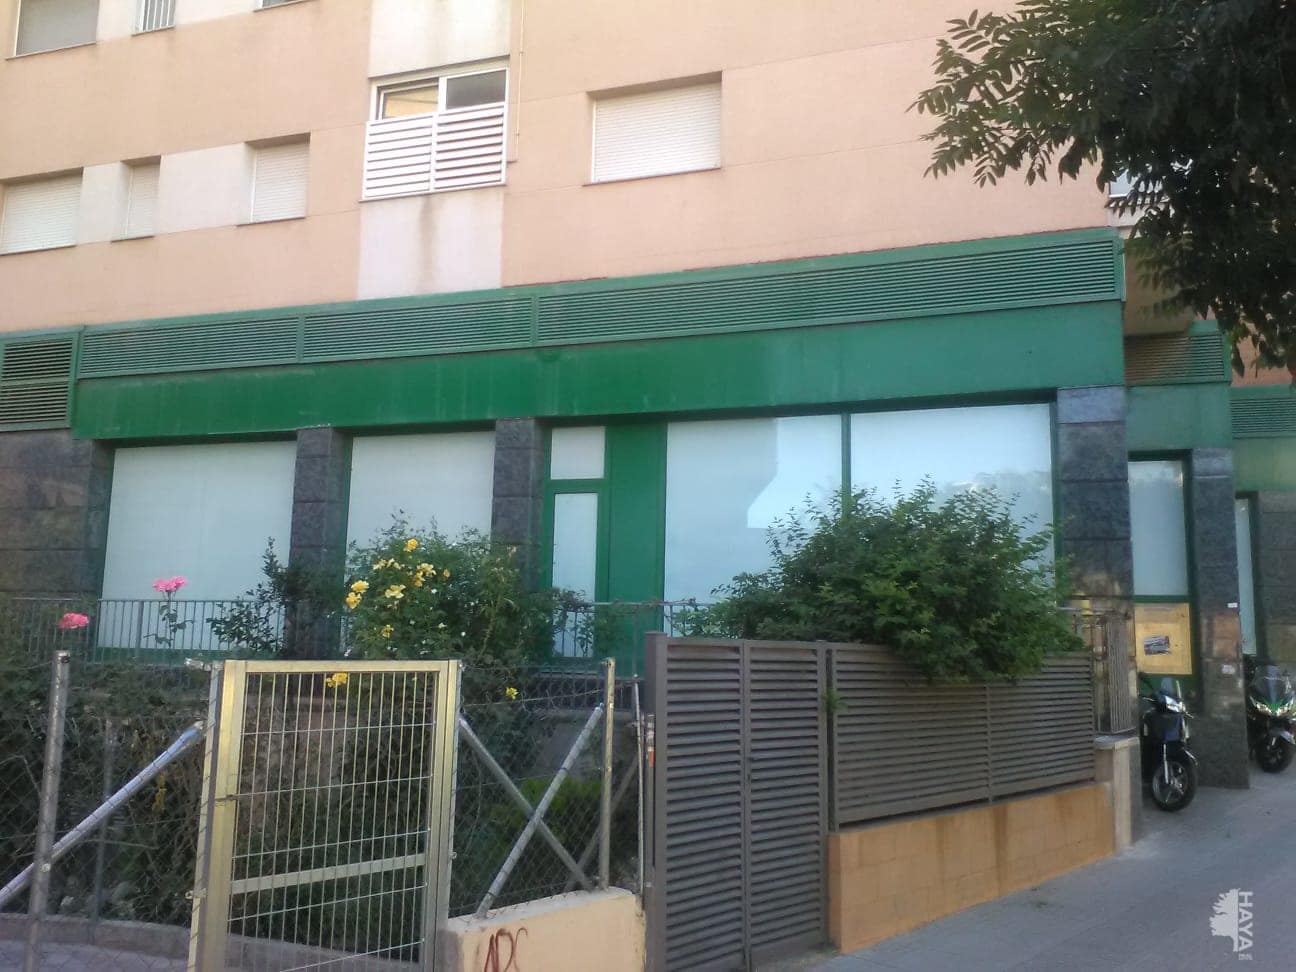 Local en venta en Olesa de Montserrat, Barcelona, Calle Arquebisbe Ramón Torrella, 296.976 €, 185 m2